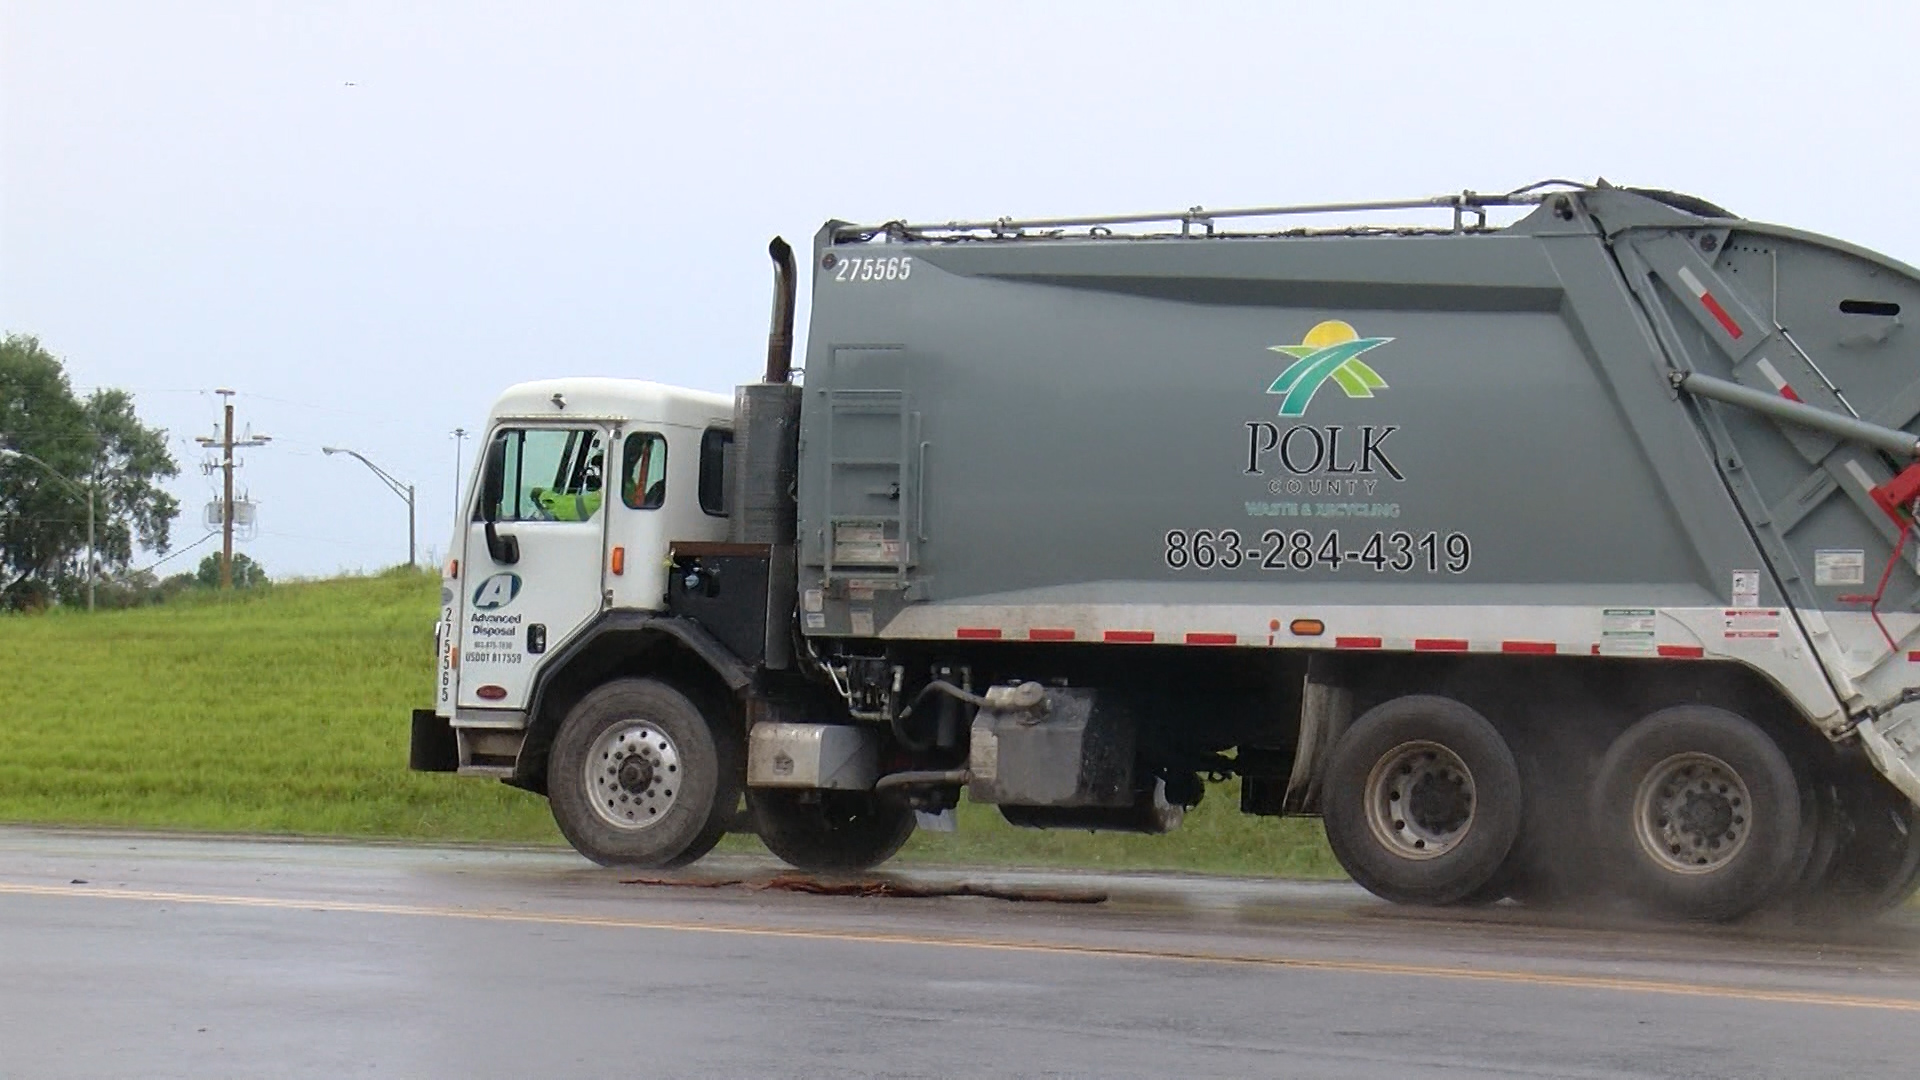 Polk Co. landfill sees spike in traffic, 750K more pounds of trash